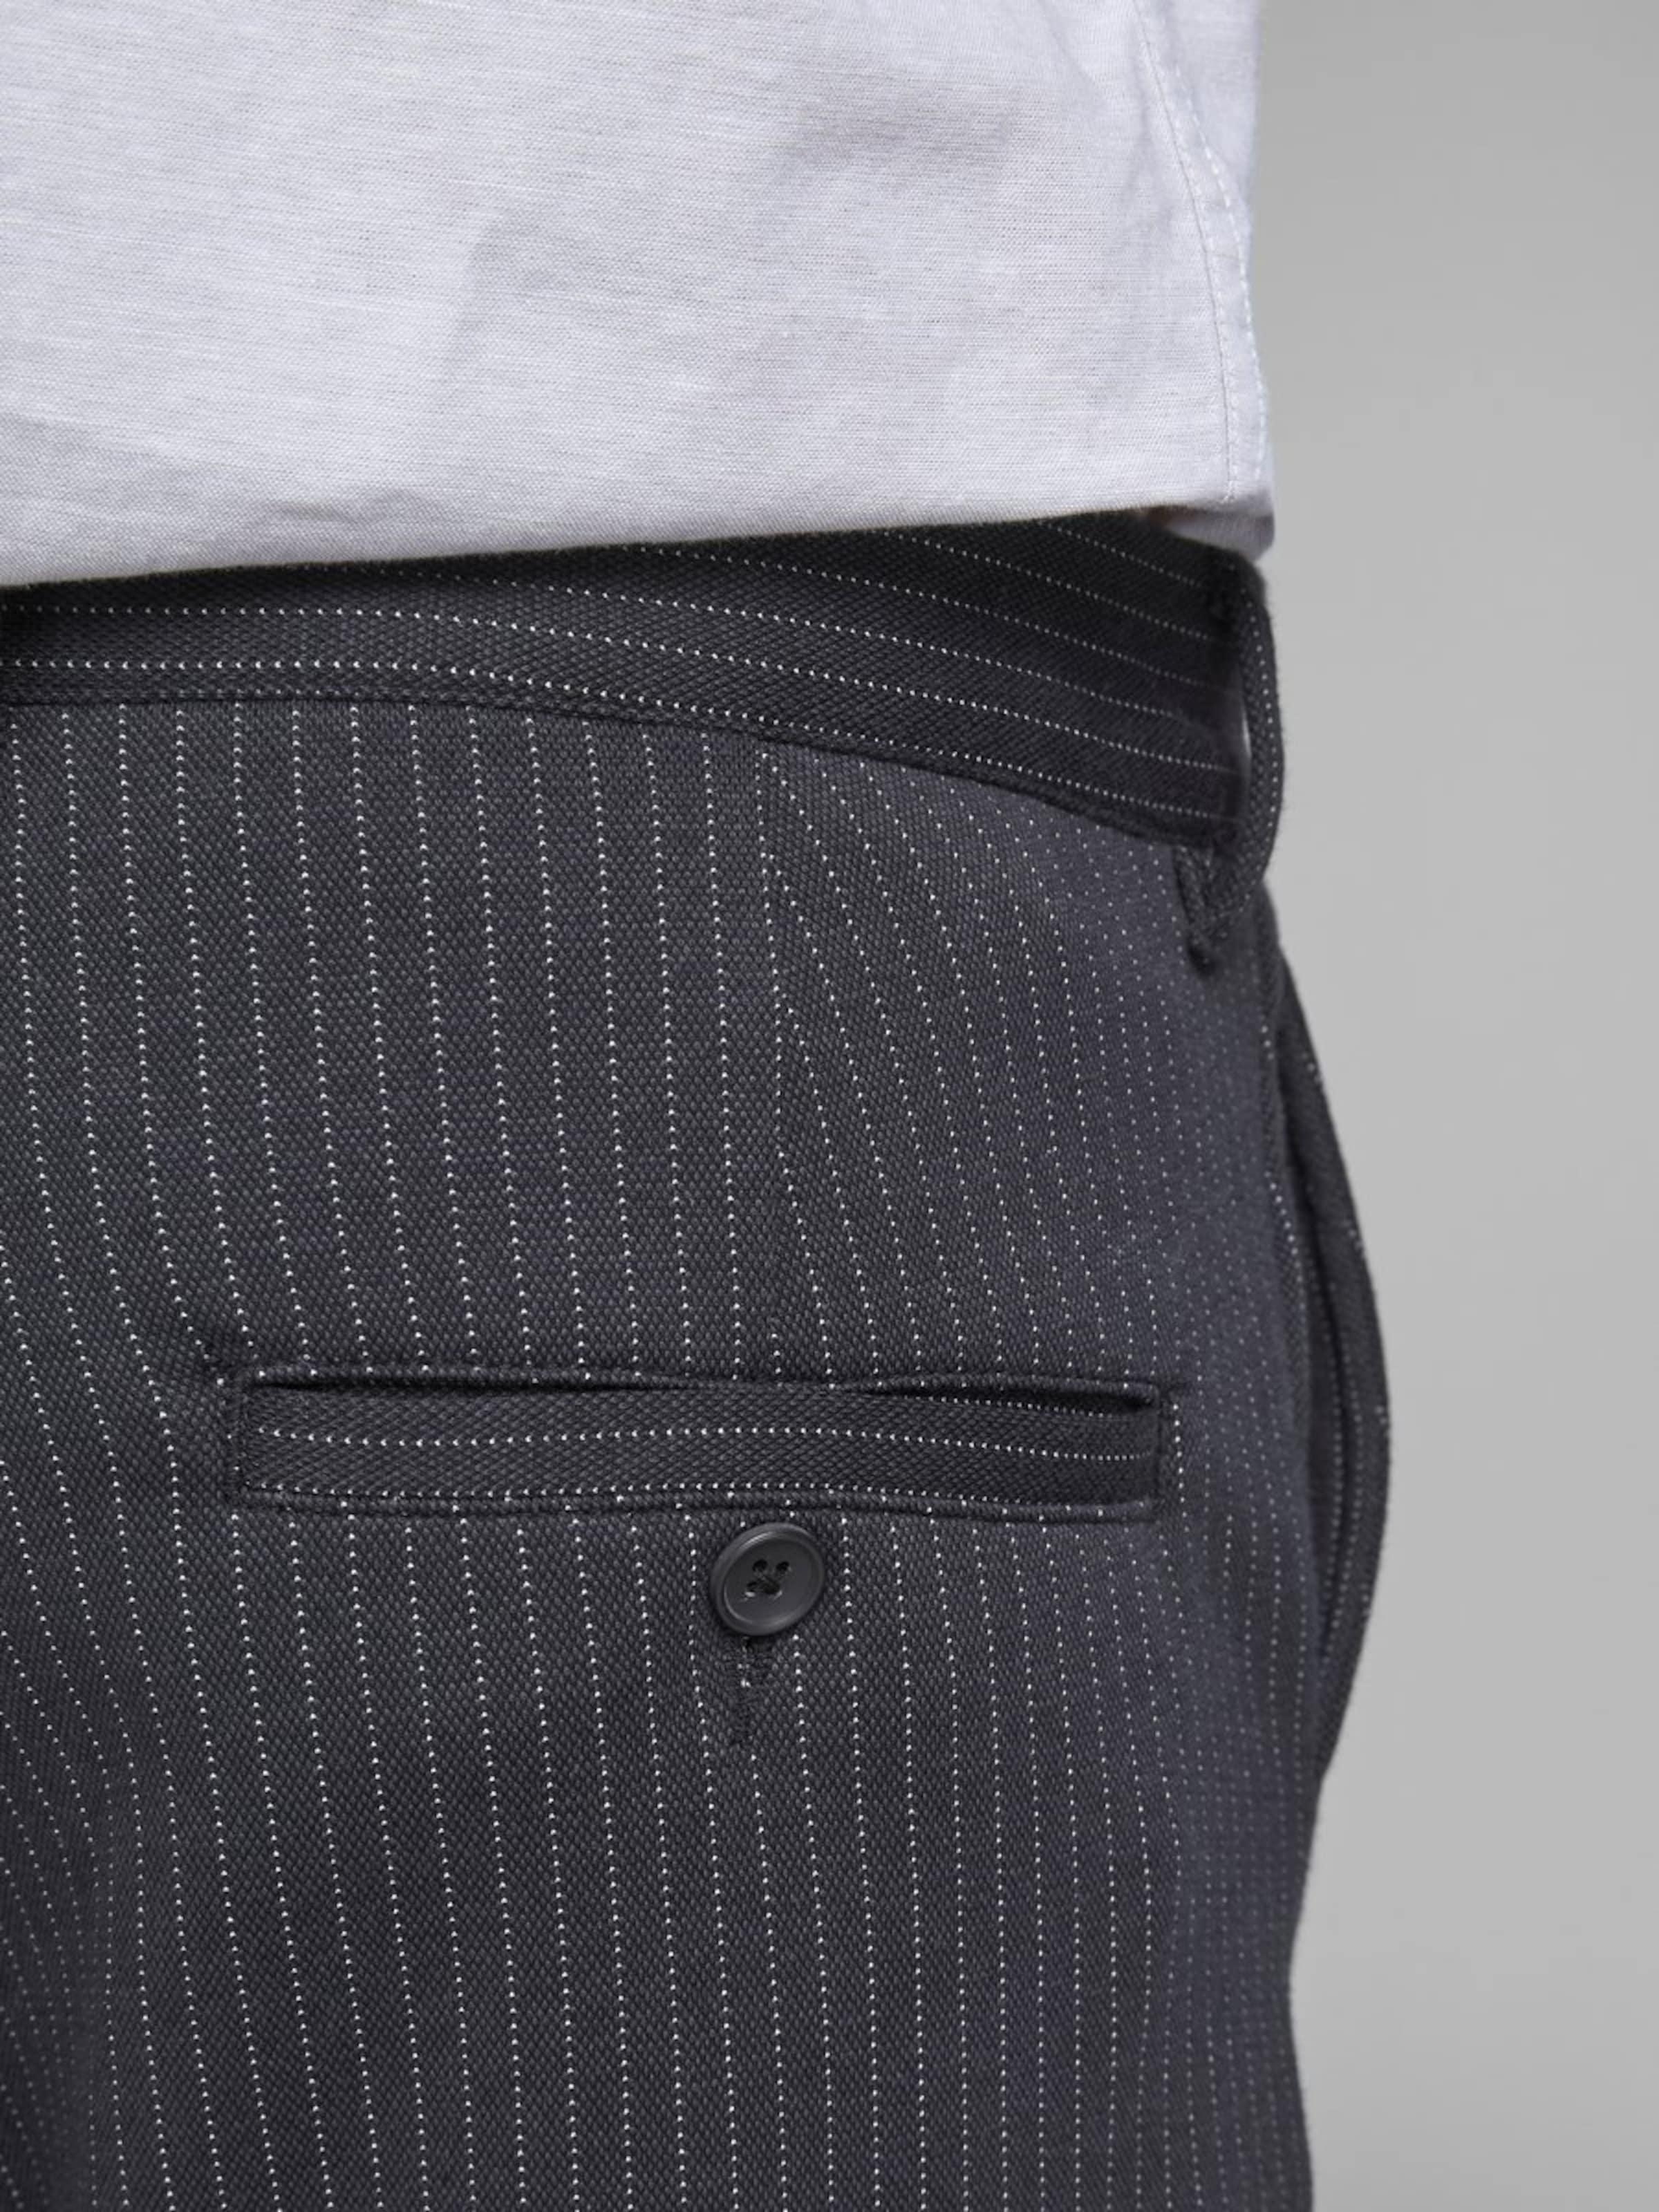 Marine Chino Jones 'sandy' Jackamp; Pantalon Bleu En K1cFJTl